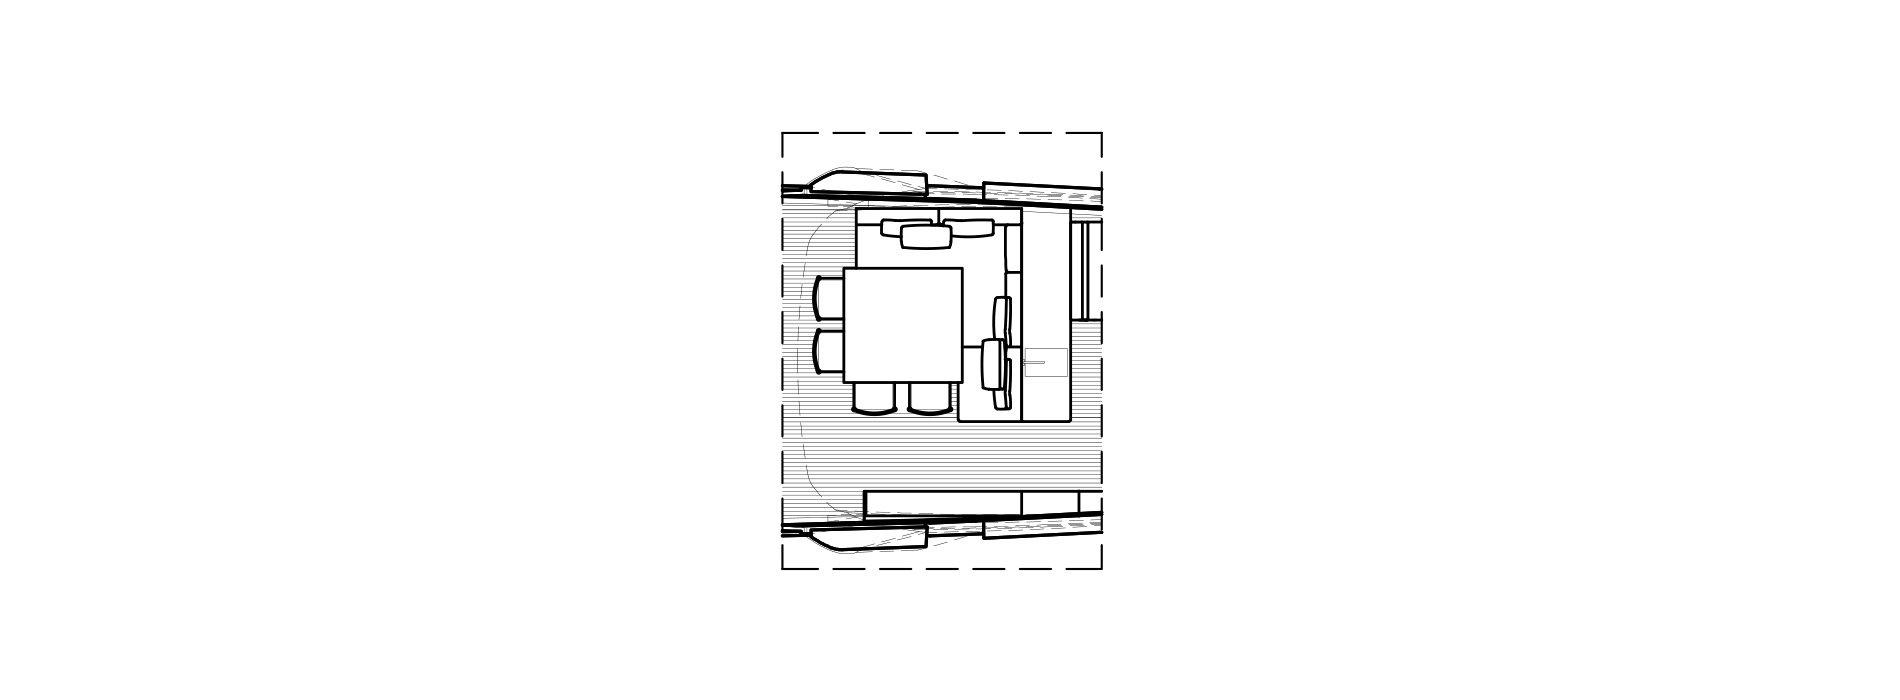 Sanlorenzo Yachts SX76 Details Version Lissoni